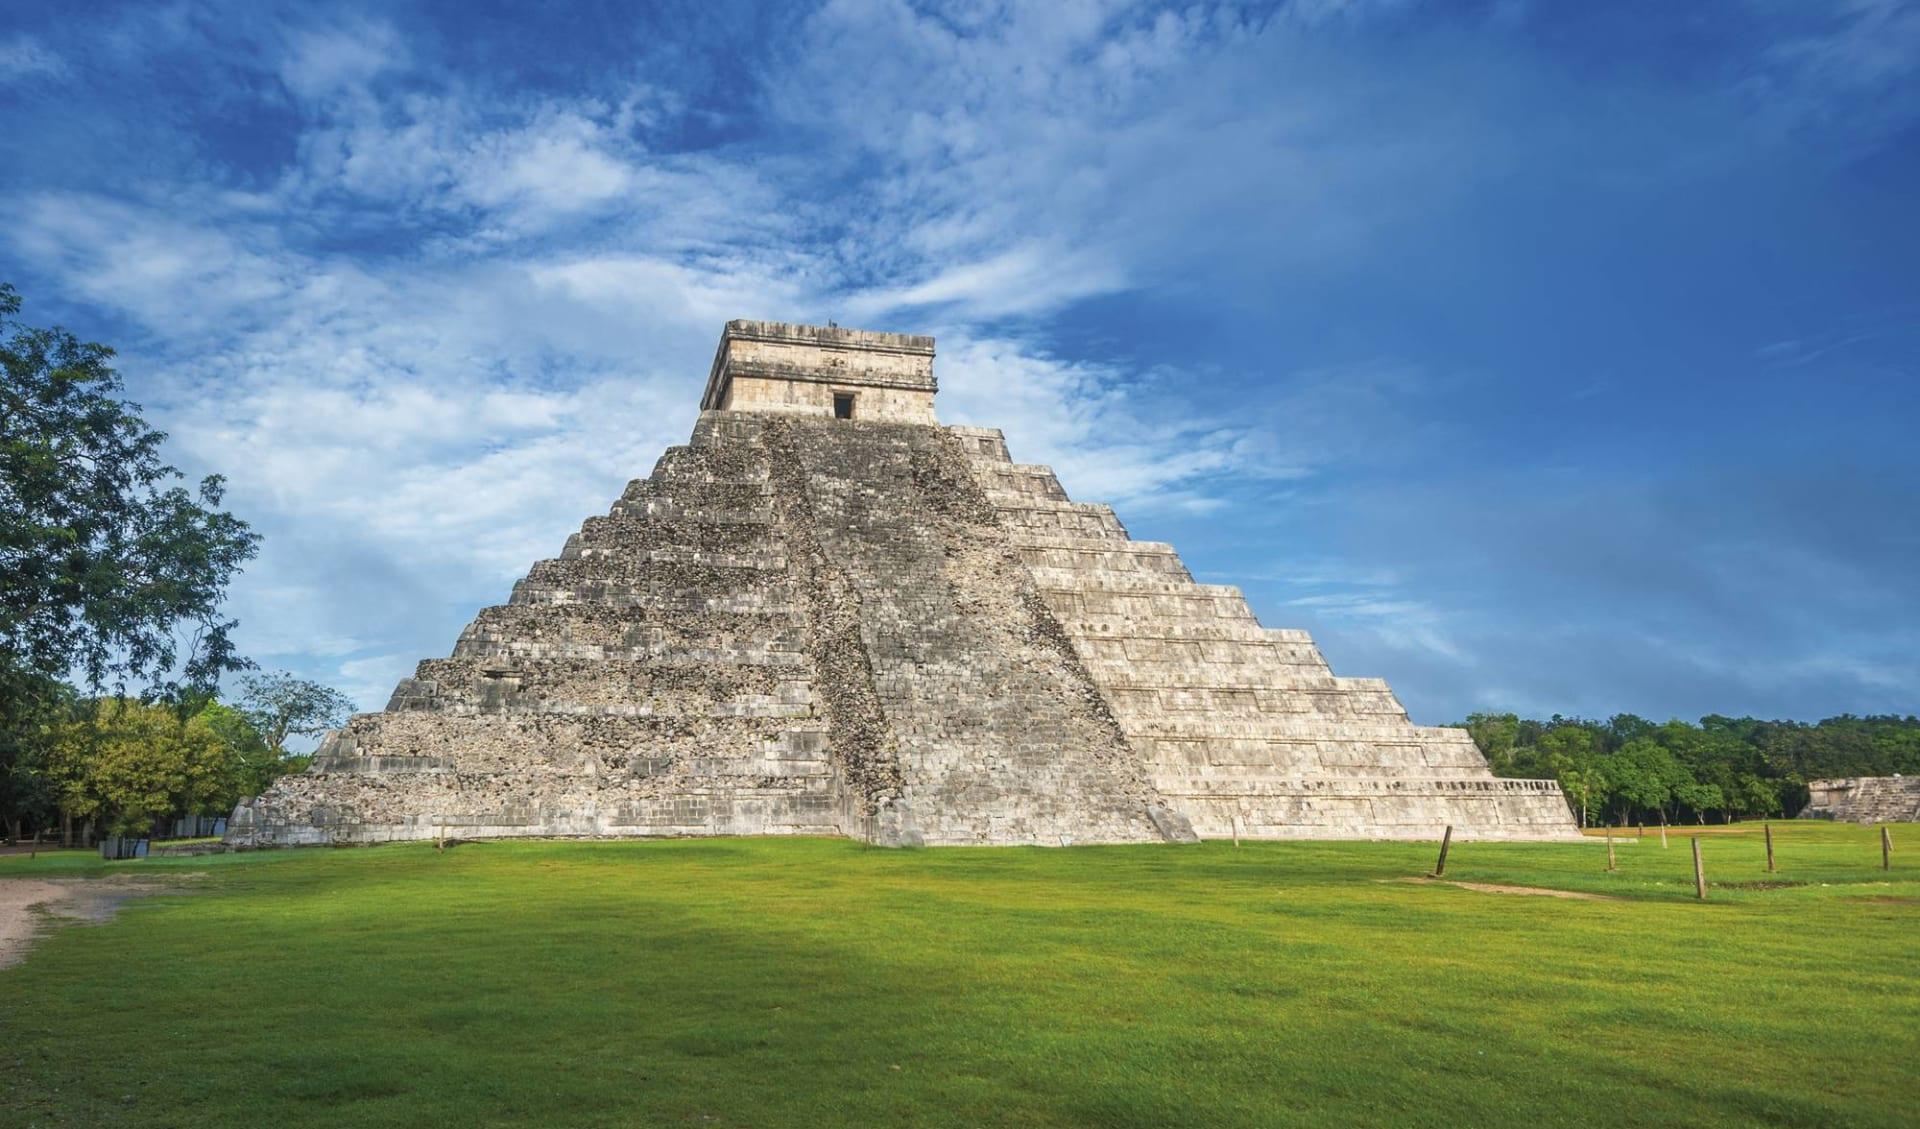 Yucatán Familienreise ab Cancun: Mexico - Yucatan - Chichen Itza, Temple of Kukulkan